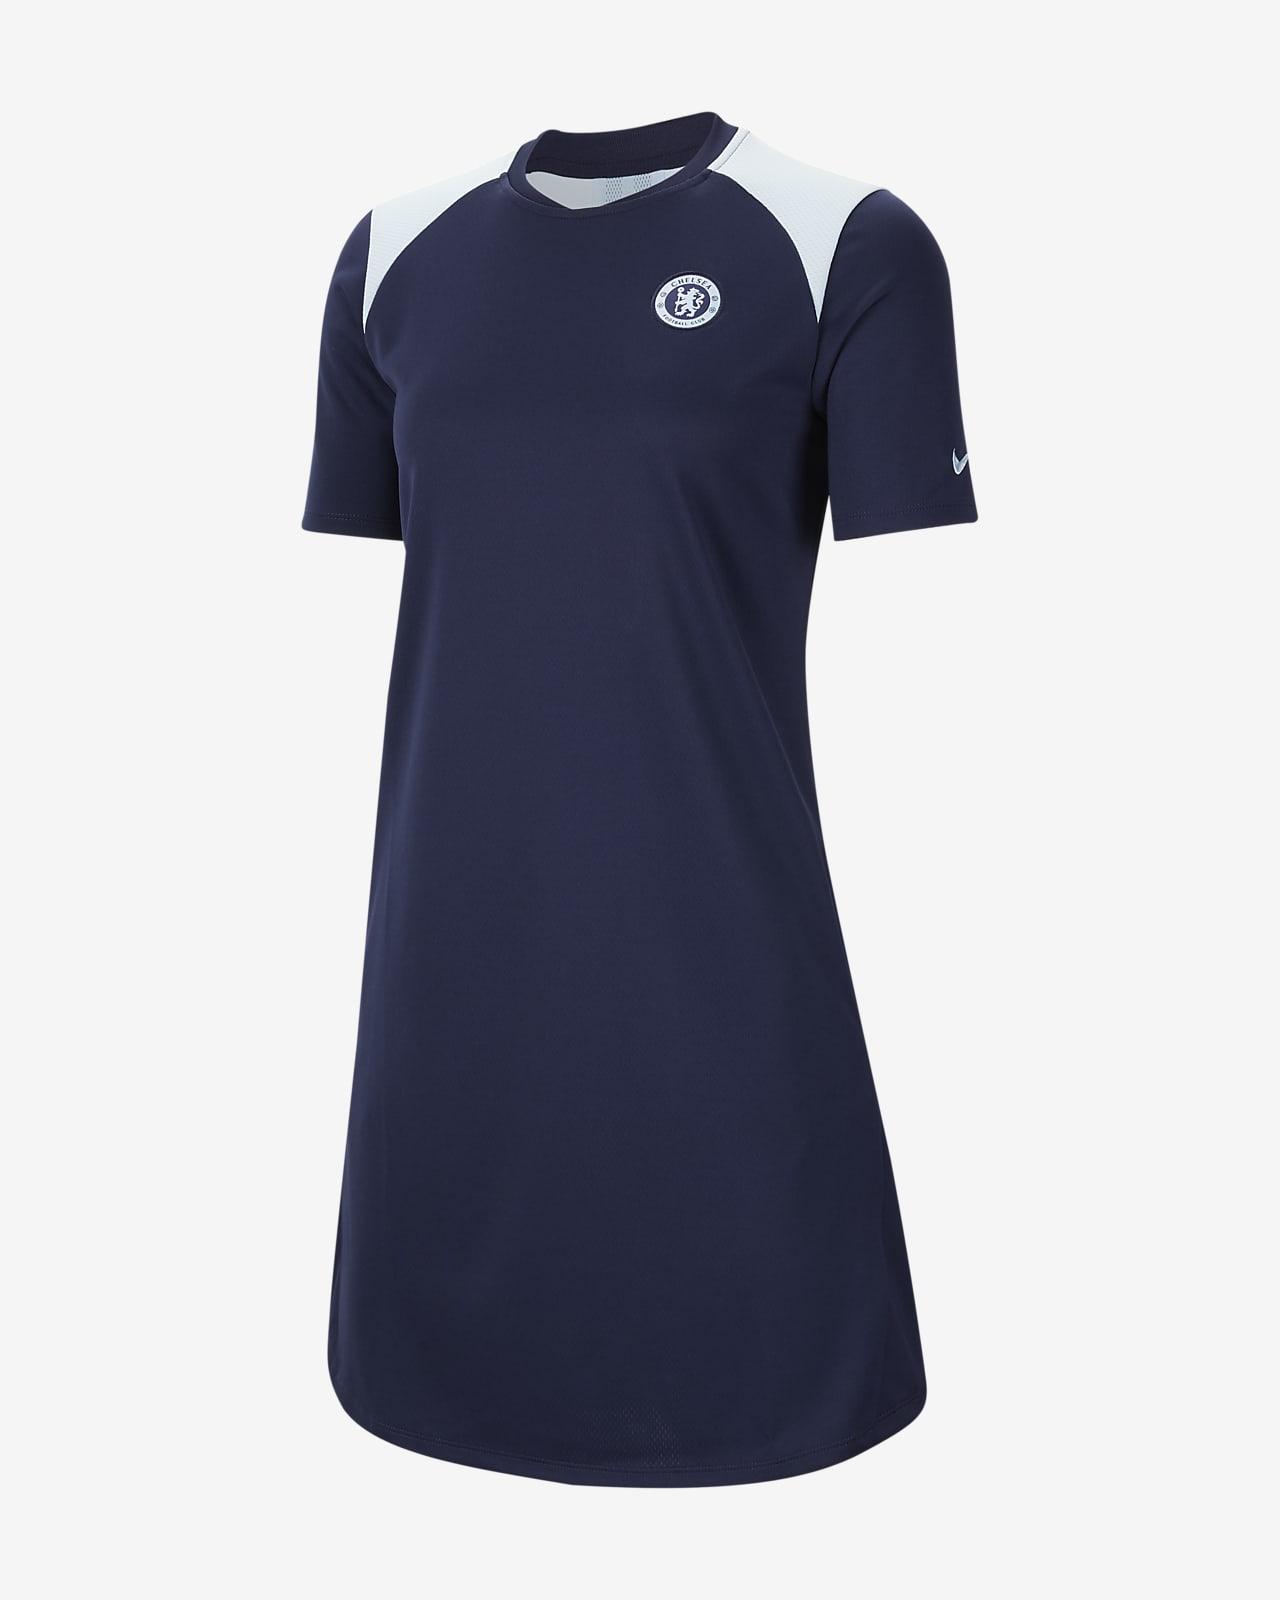 Robe de football en jersey Chelsea FC pour Femme